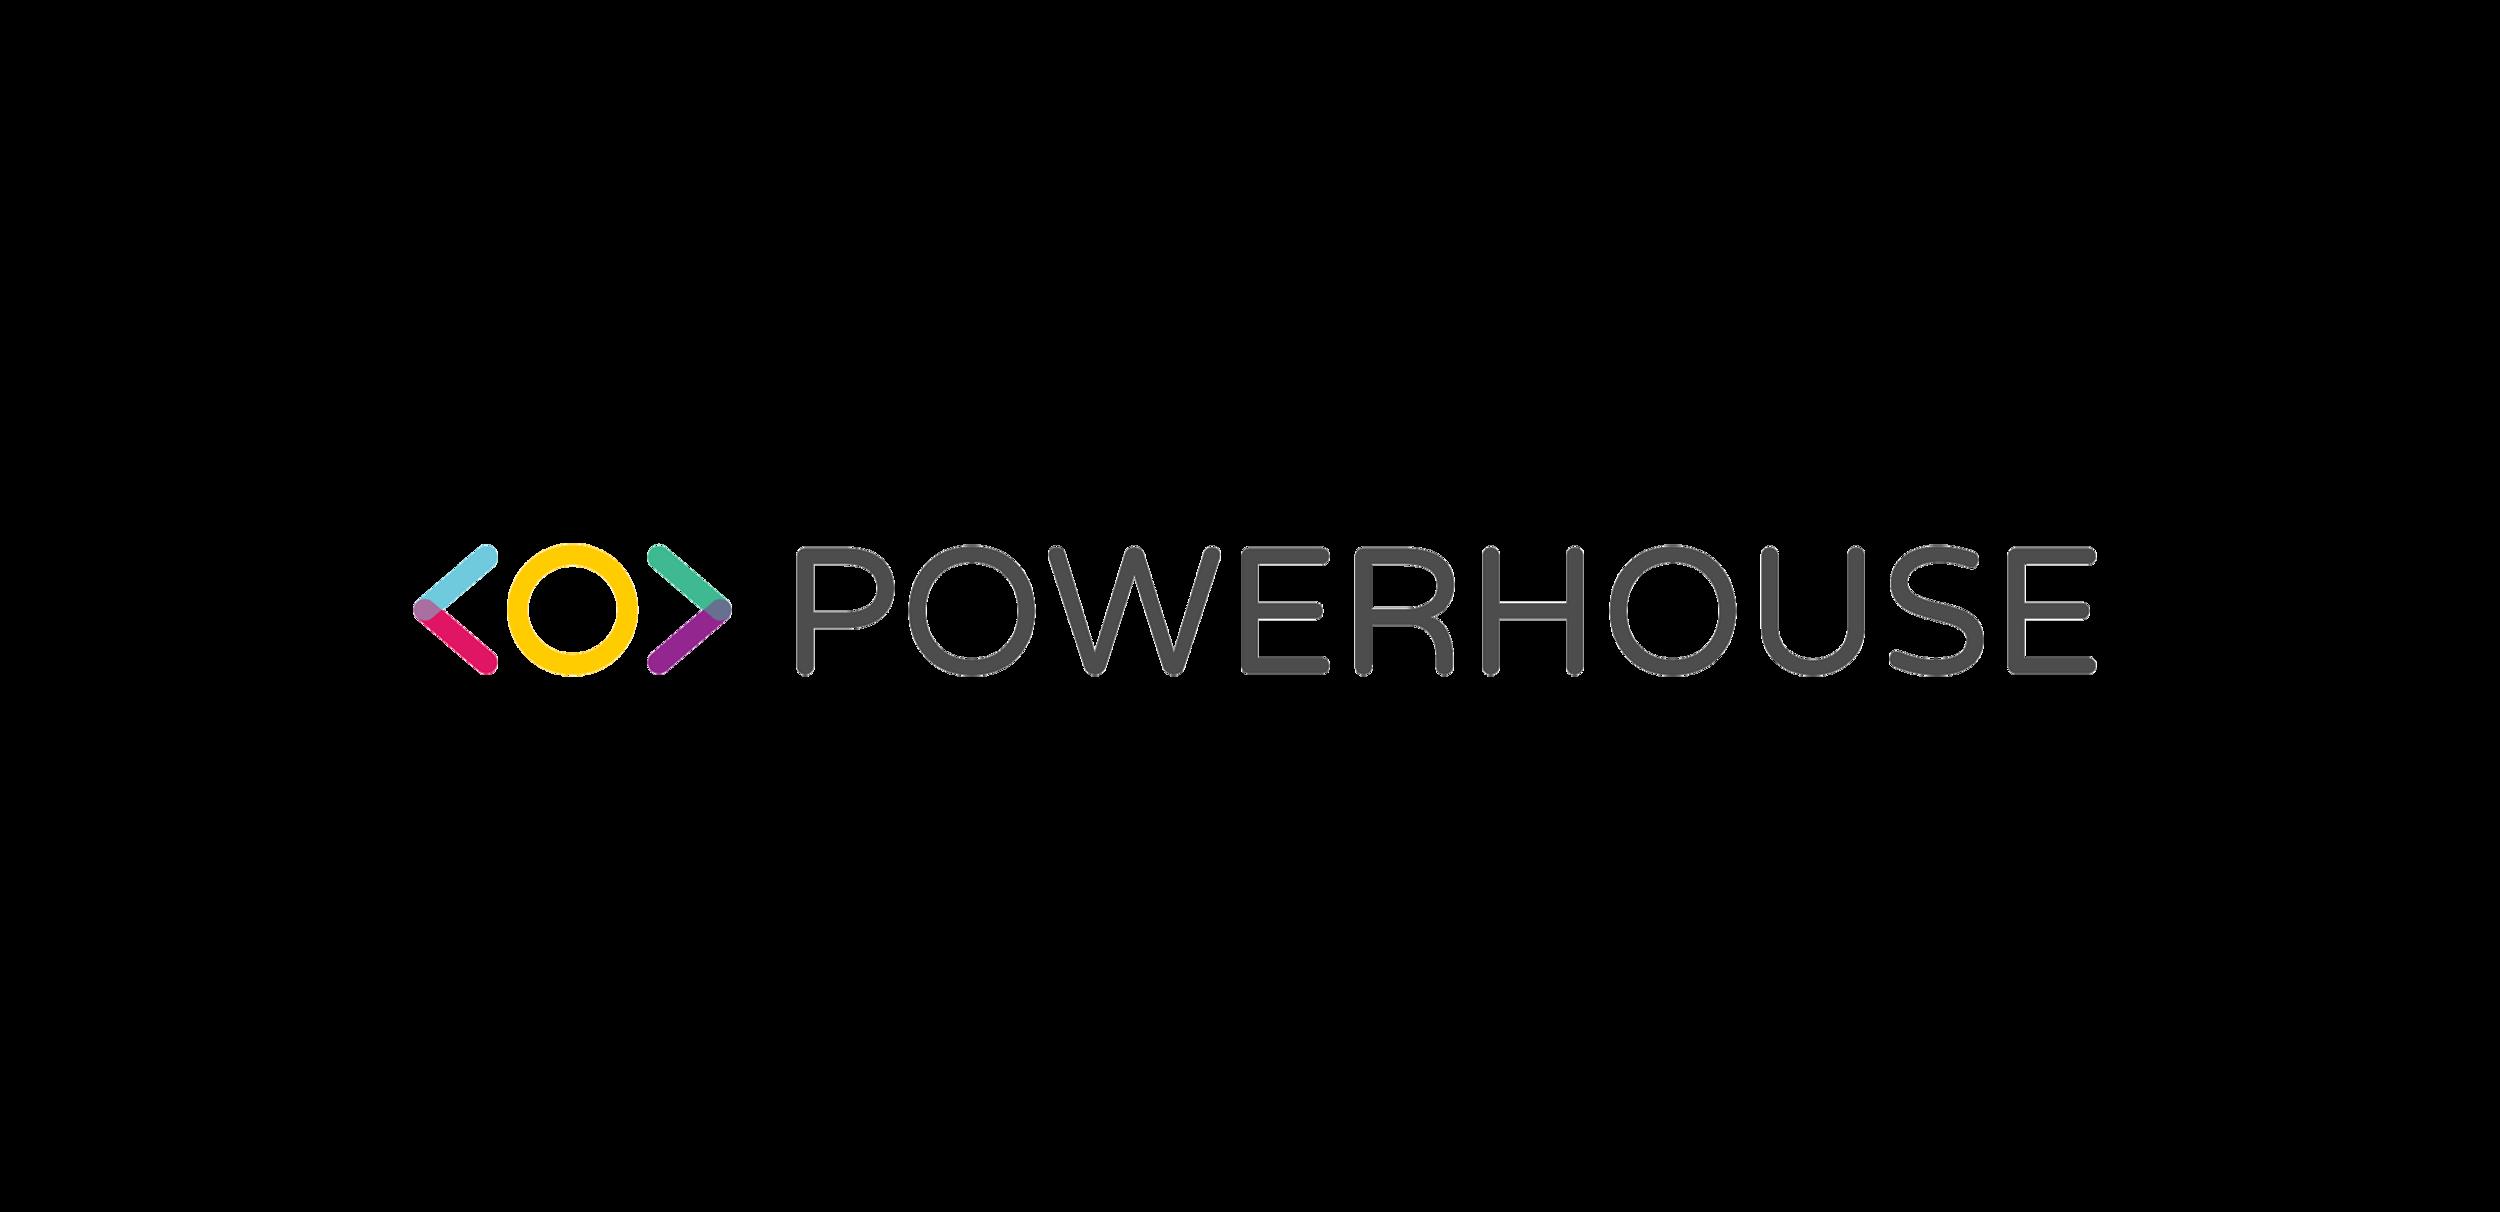 powerhouse2.png